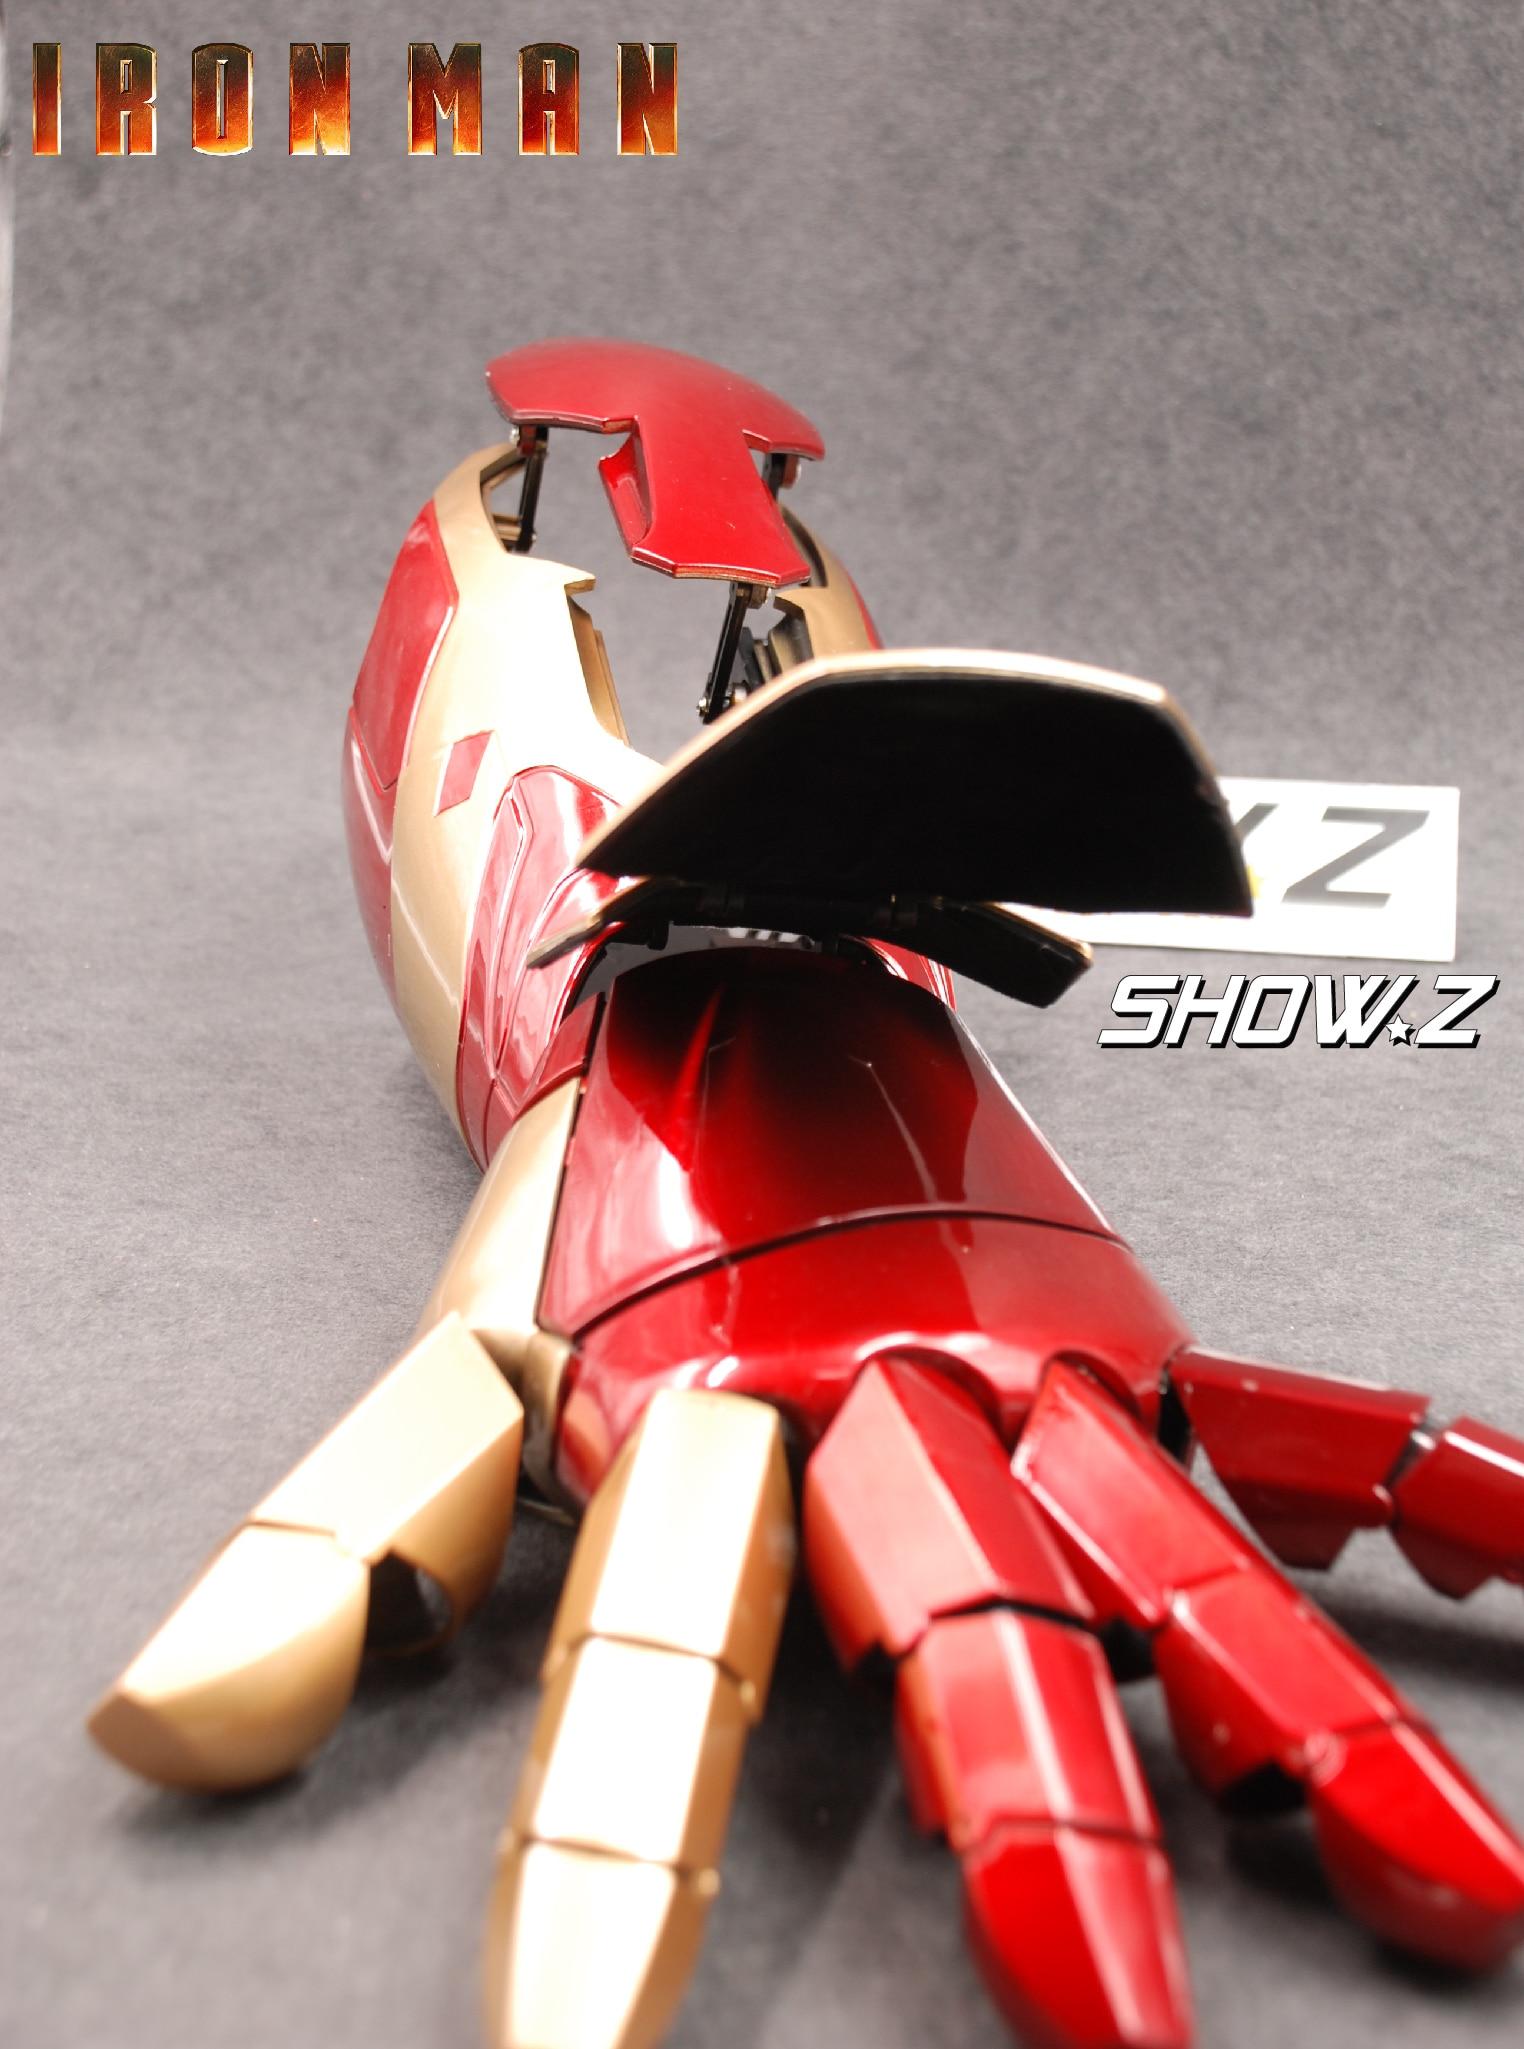 Cattoys MK42 Arm Left 1//1 LED Armor Hand IronMan MK42 Wearable Blaster Gauntlet